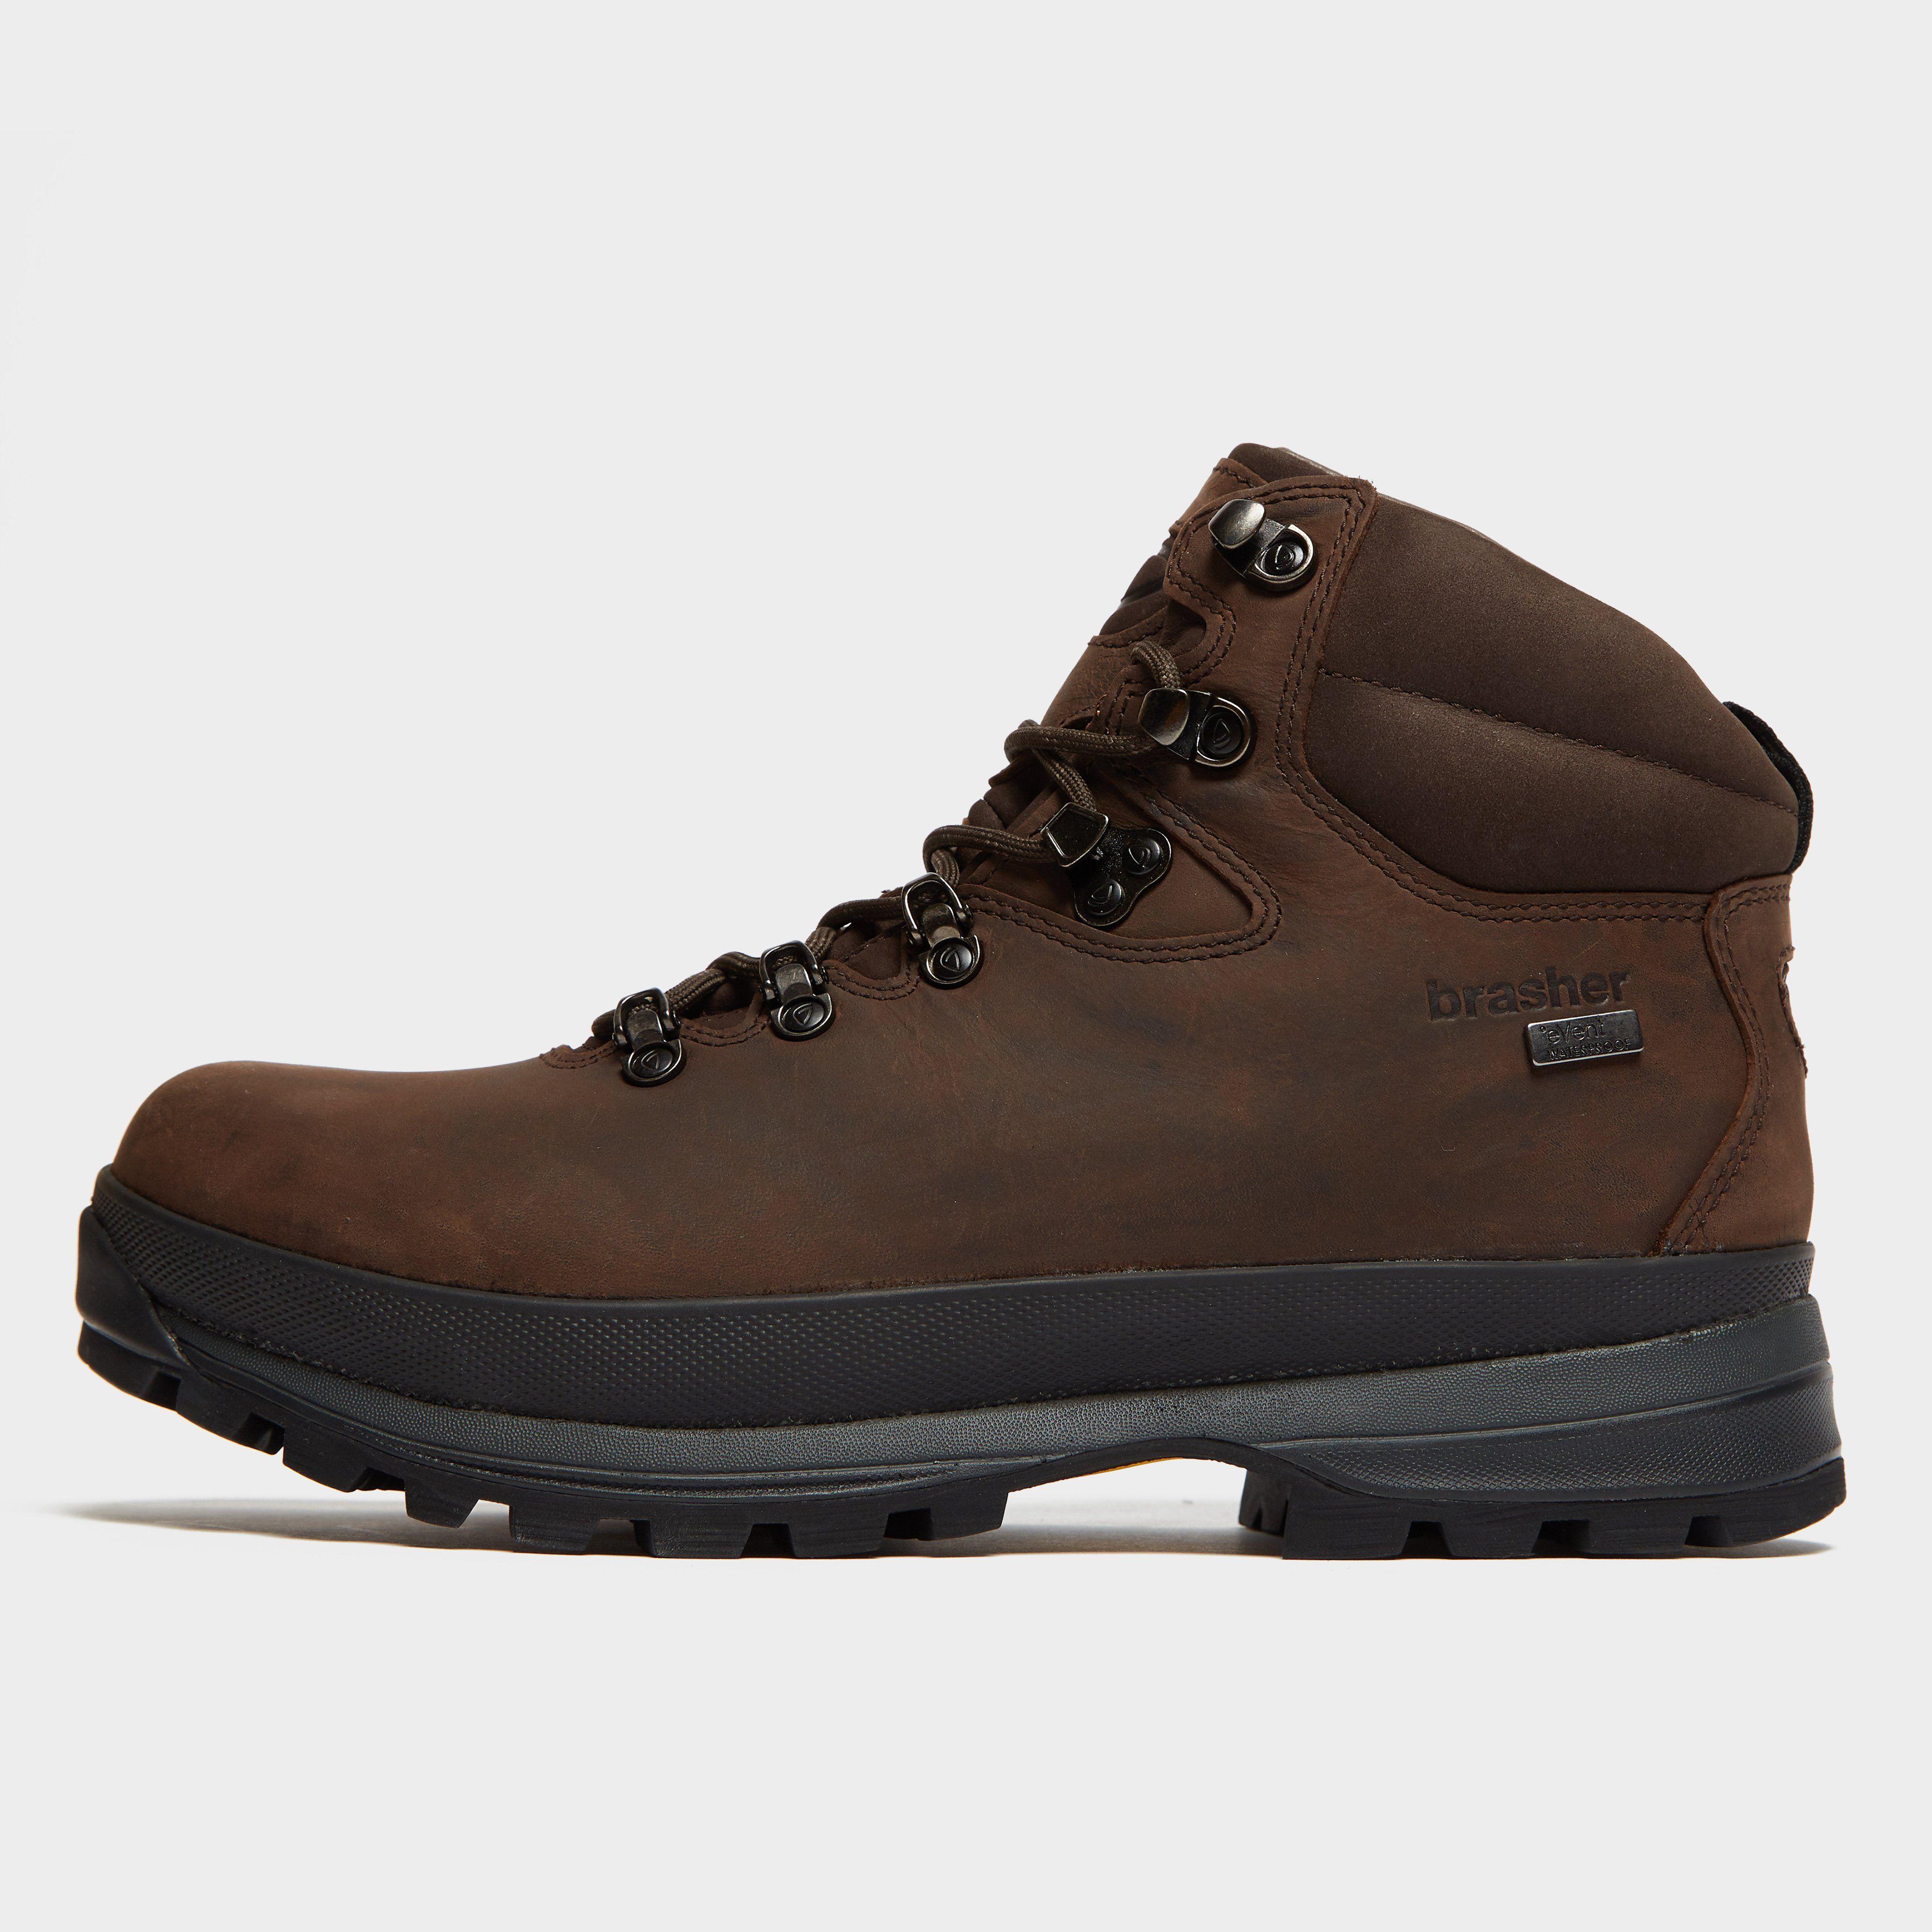 BRASHER Men's Country Master Walking Boots